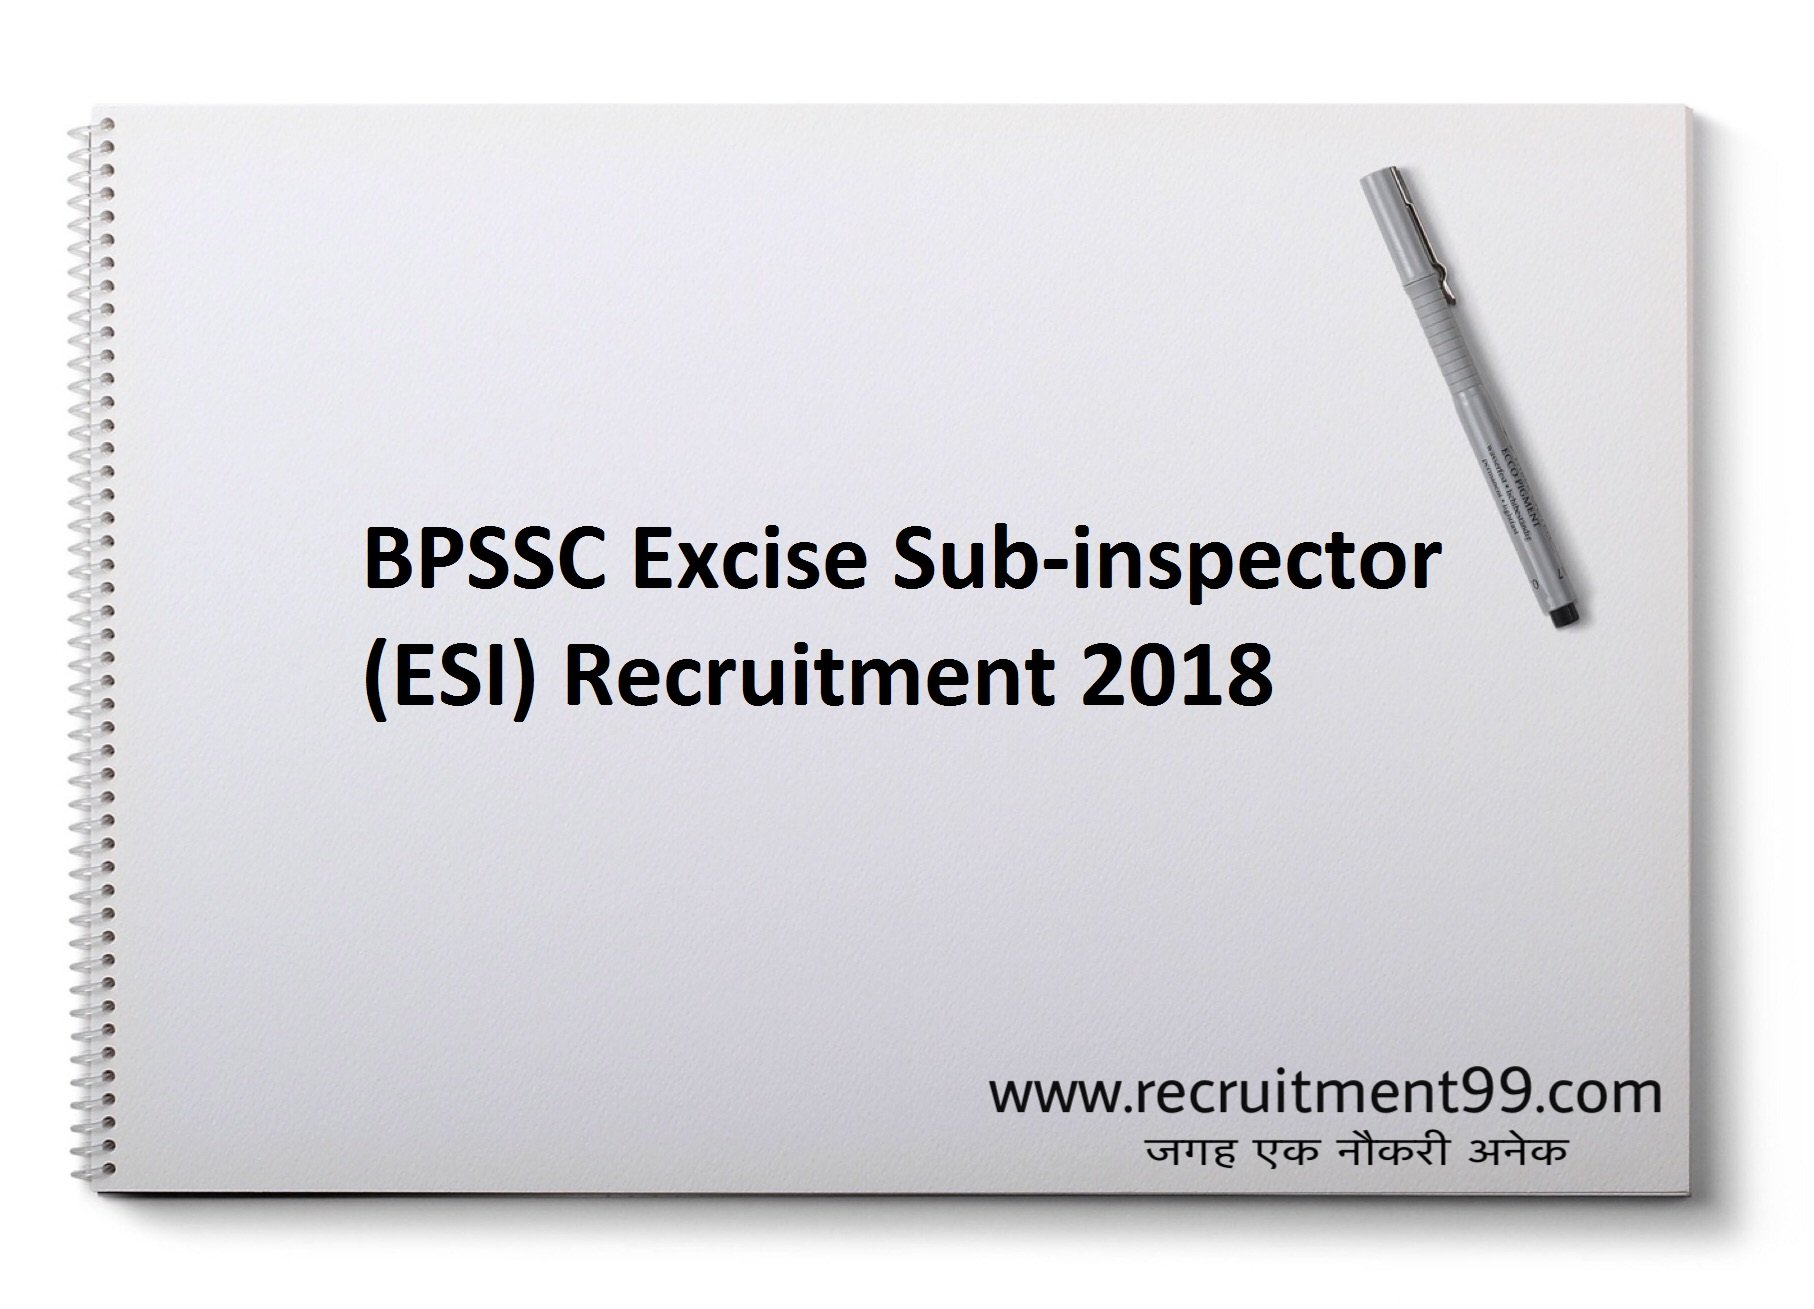 BPSSC Excise Sub Inspector ESI Recruitment Admit Card Result 2018